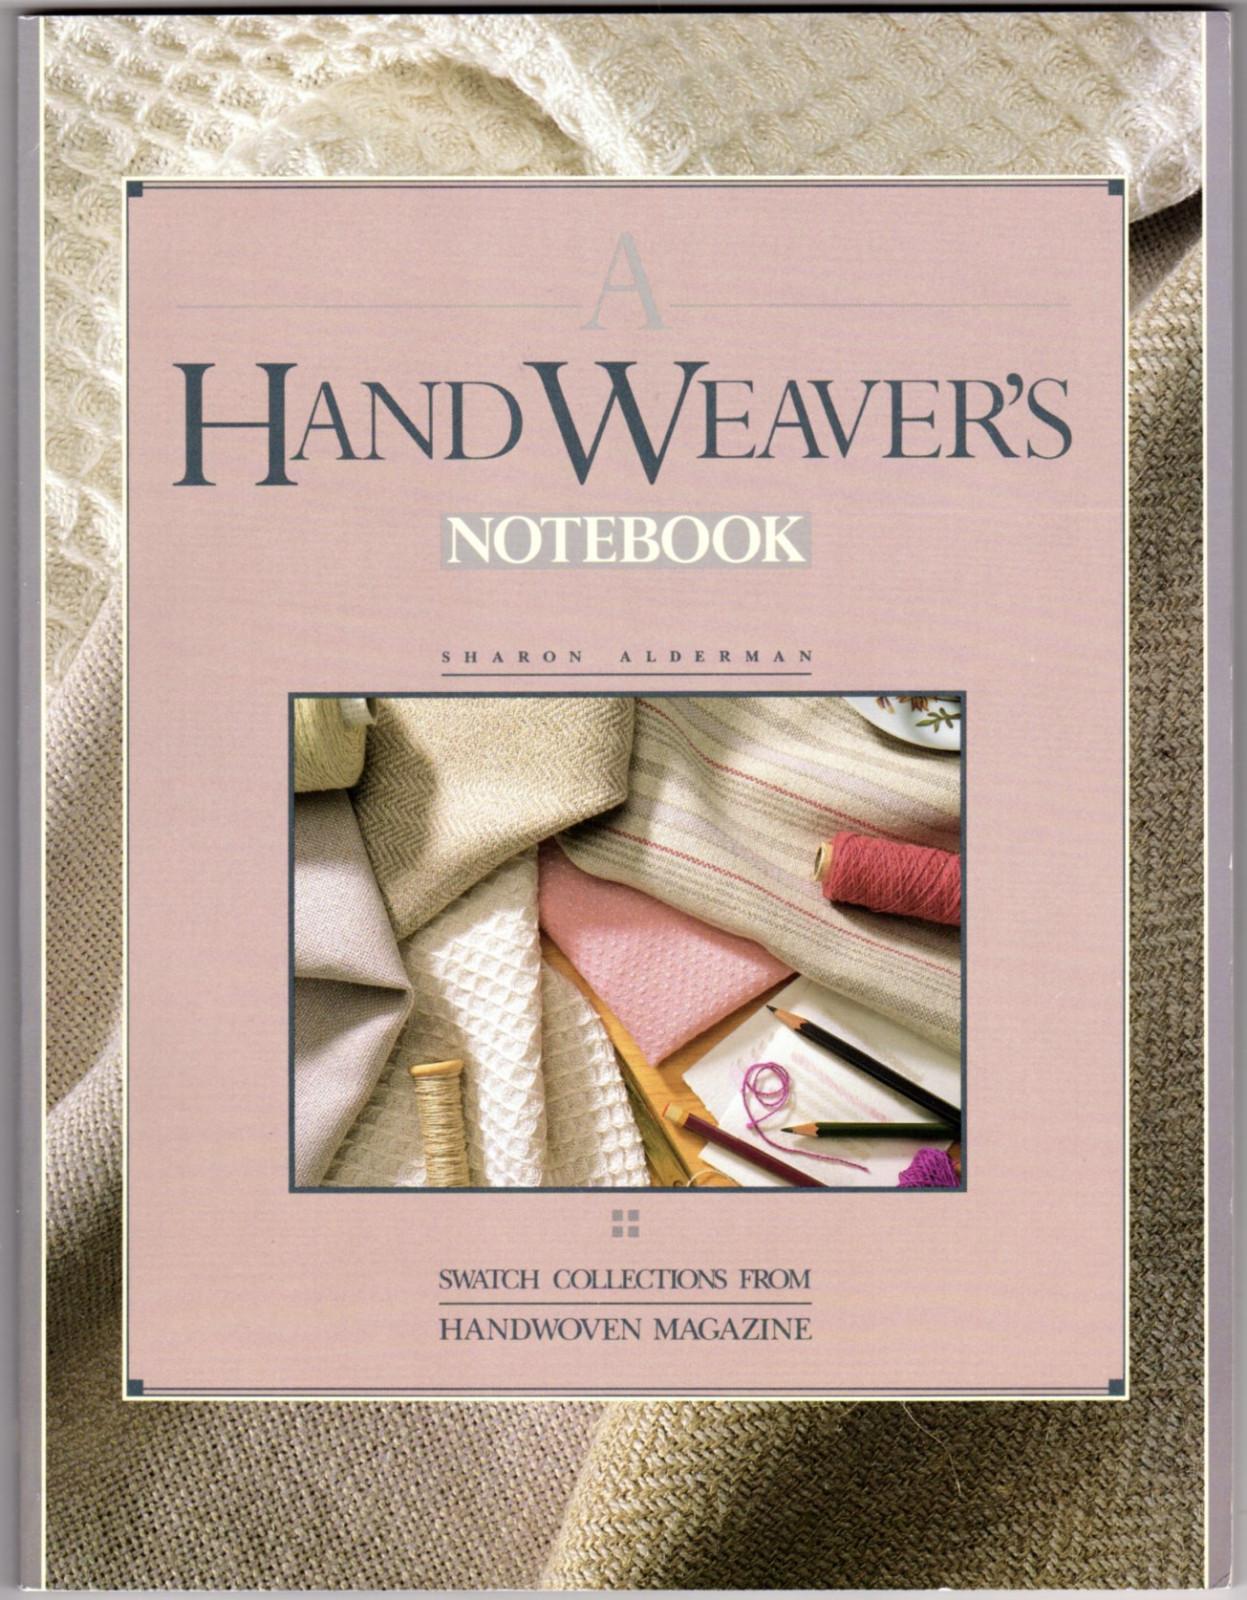 Image 0 of A Handweaver's Notebook